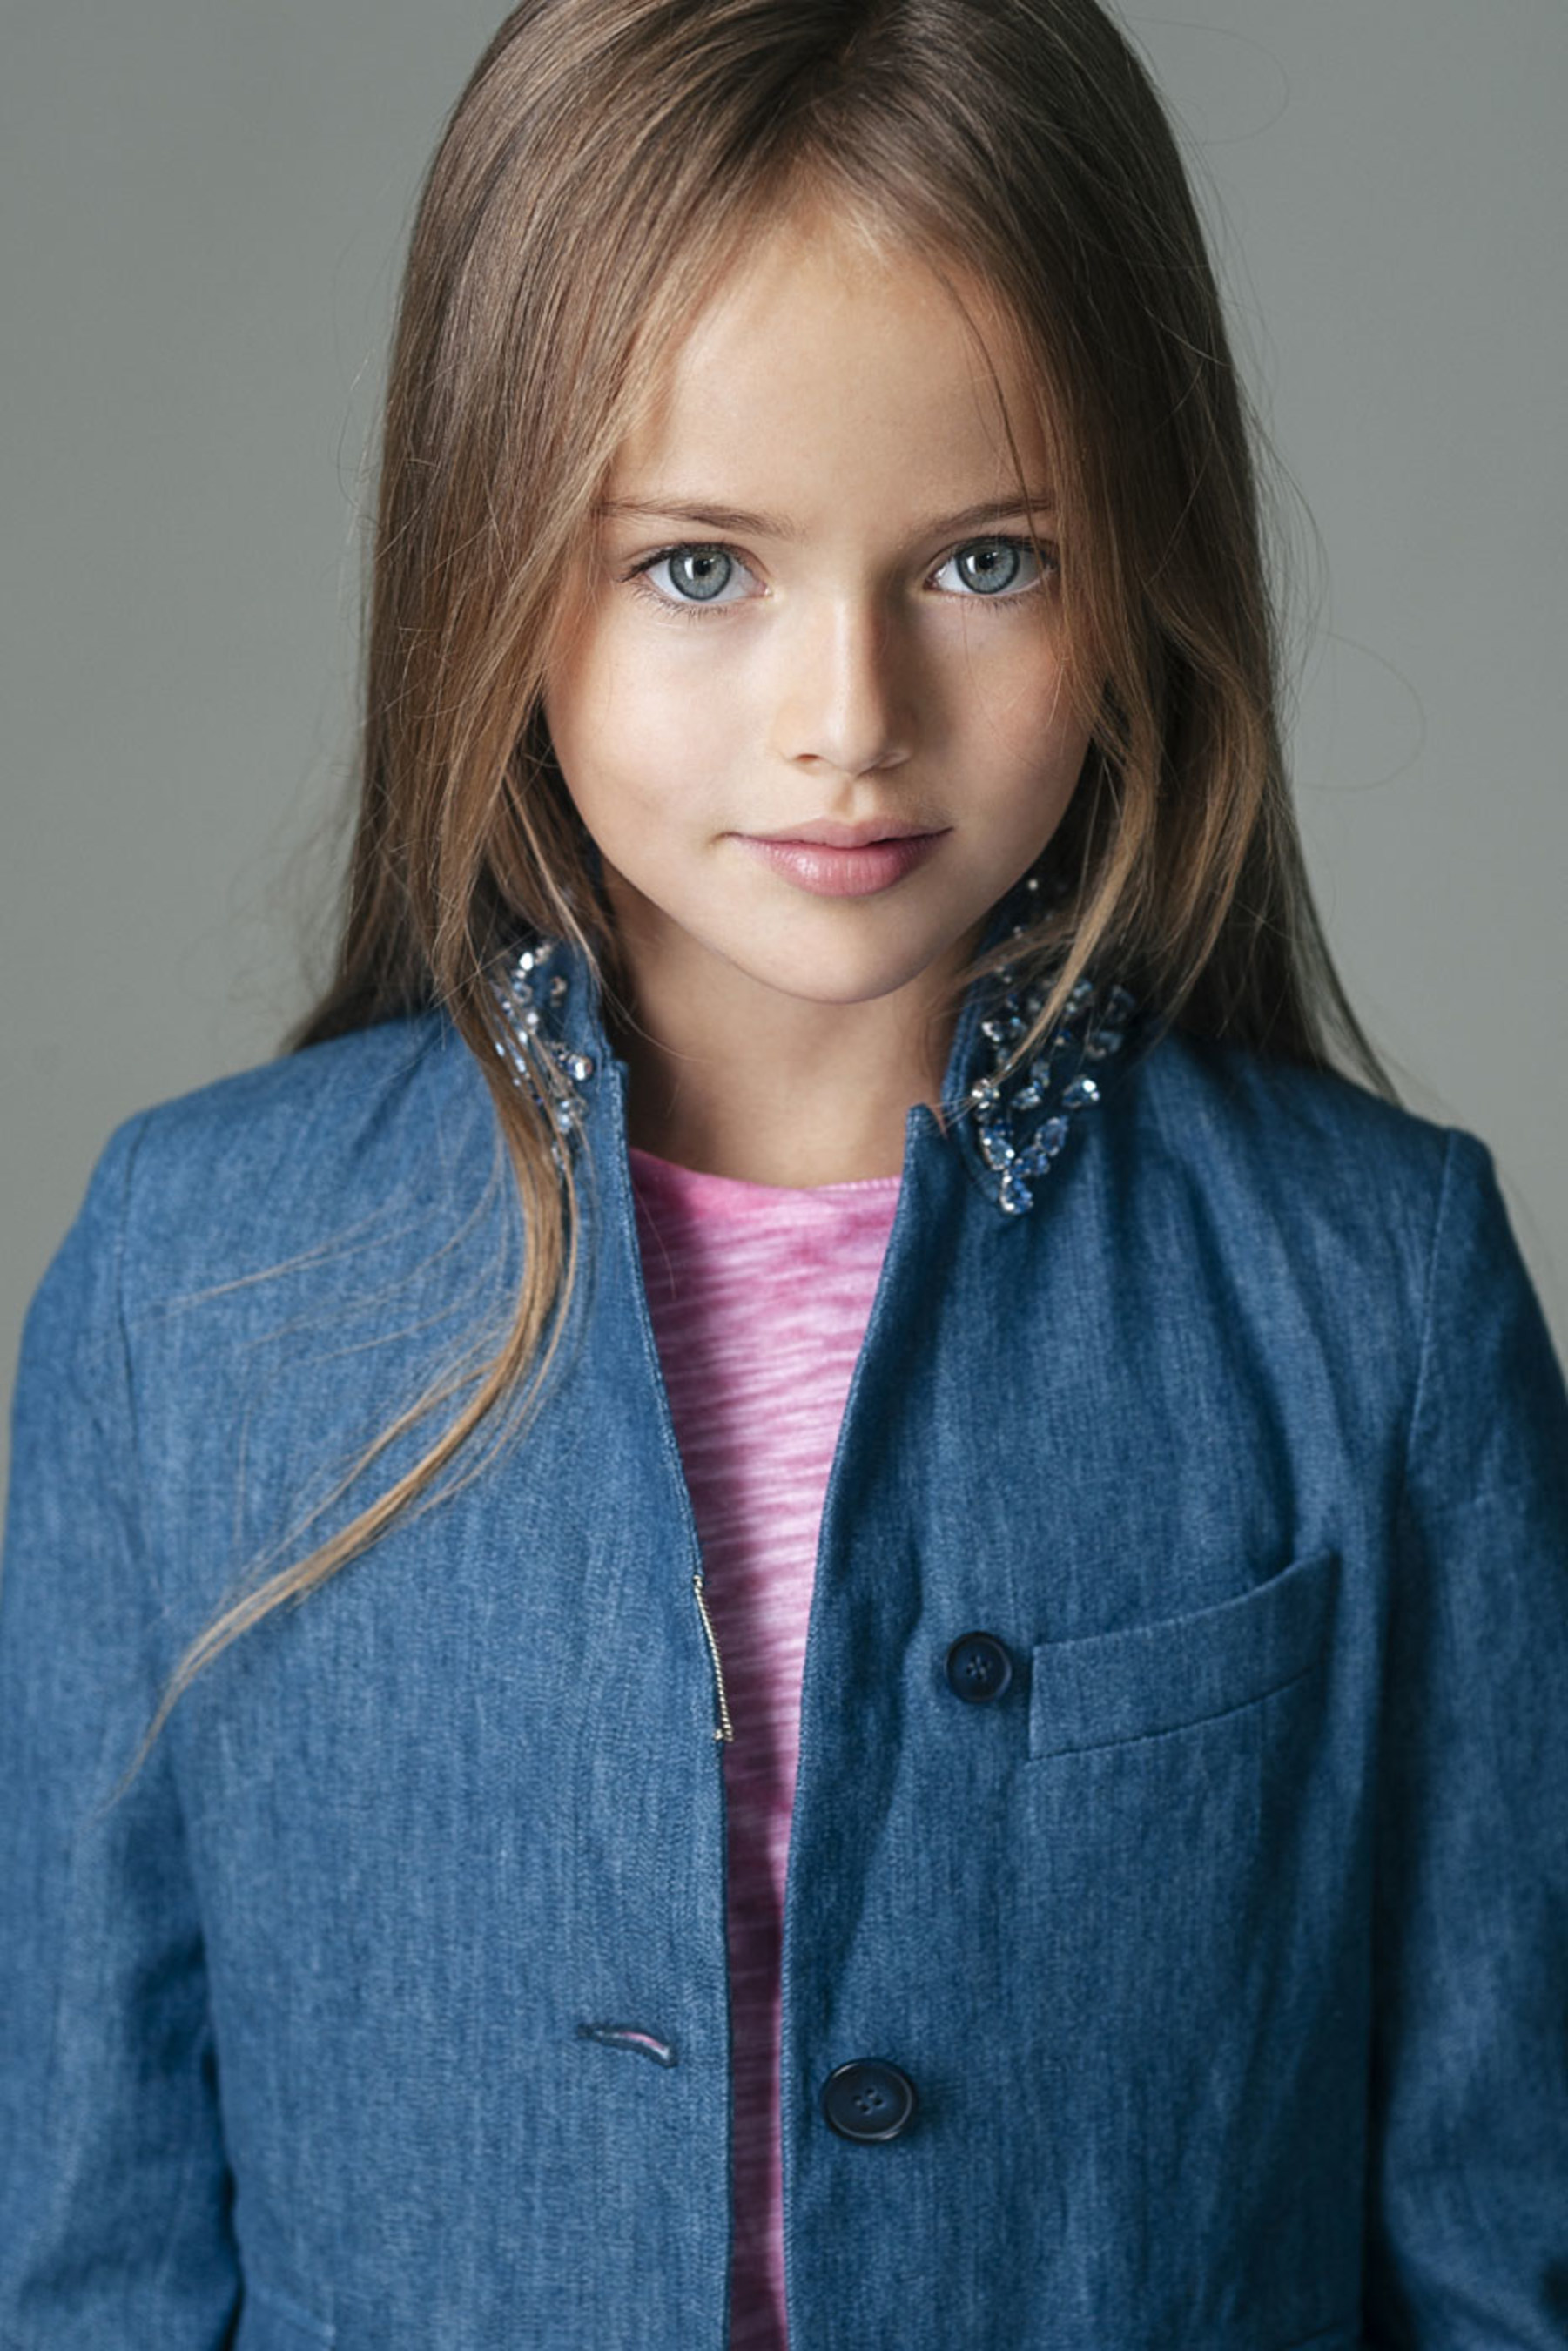 Bernard P. Wolfsdorf Helps Model Kristina Pimenova Become One of the Youngest O-1 Visa Holders